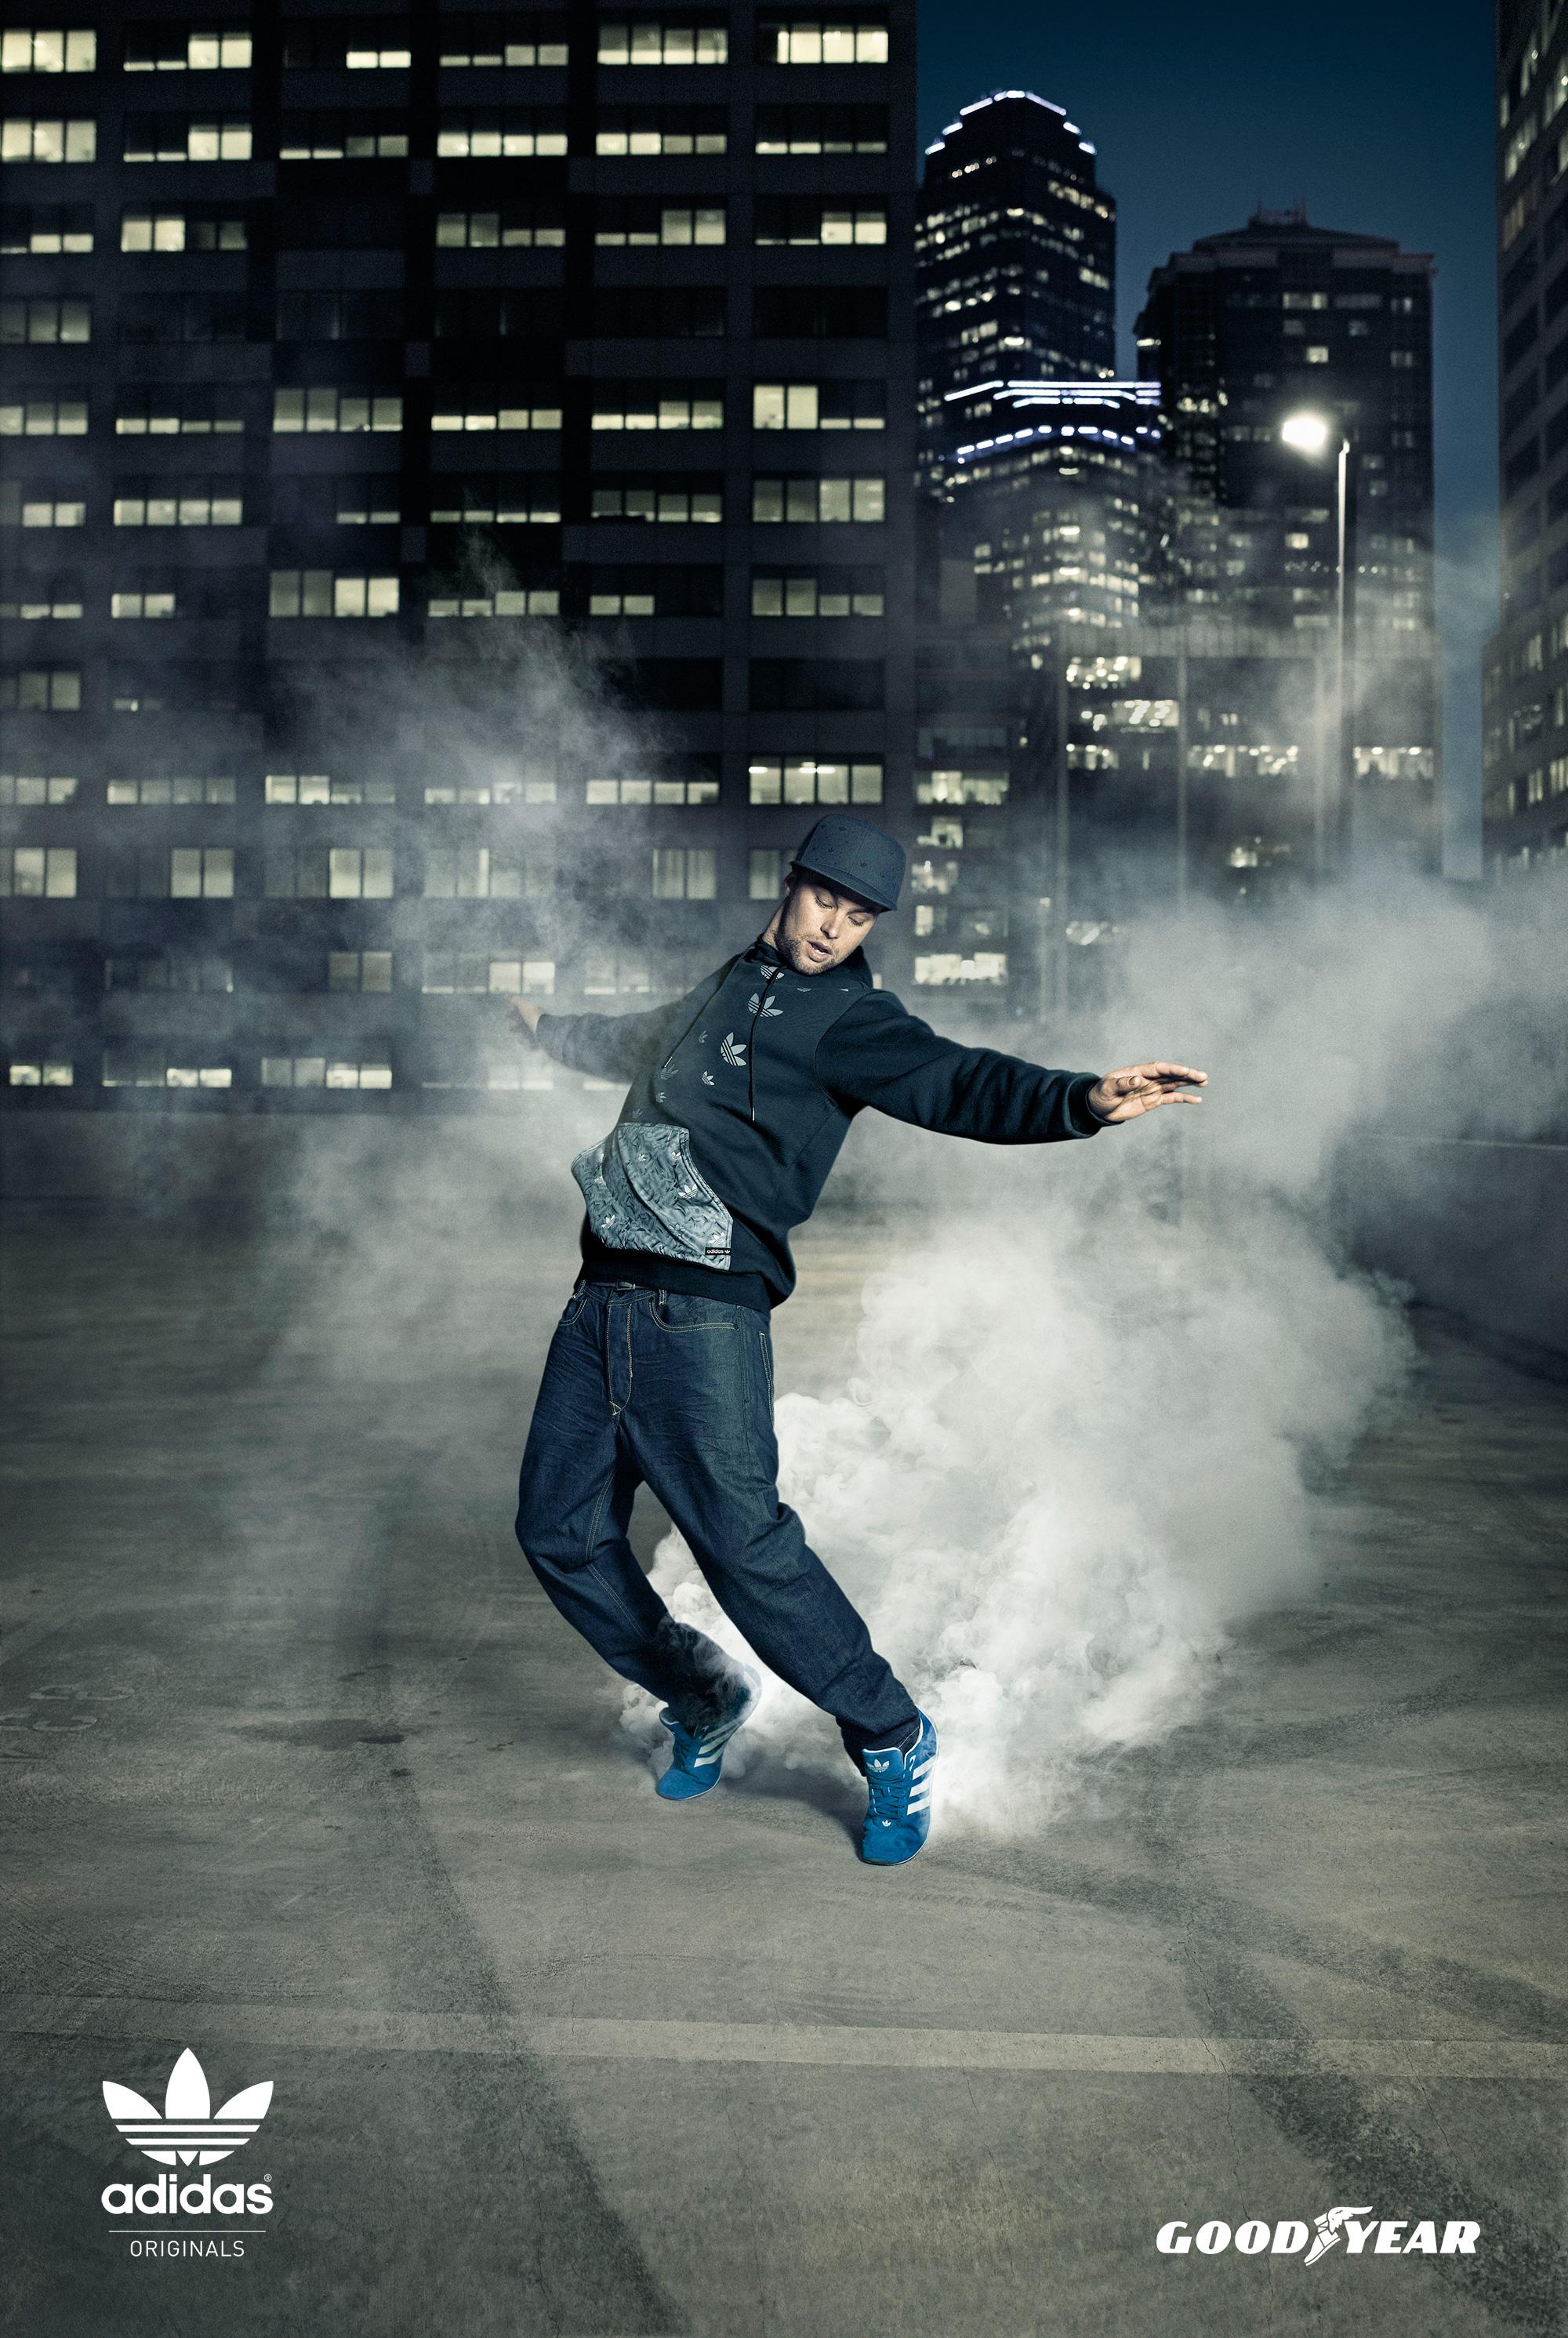 Adidas-Goodyear-1.jpg